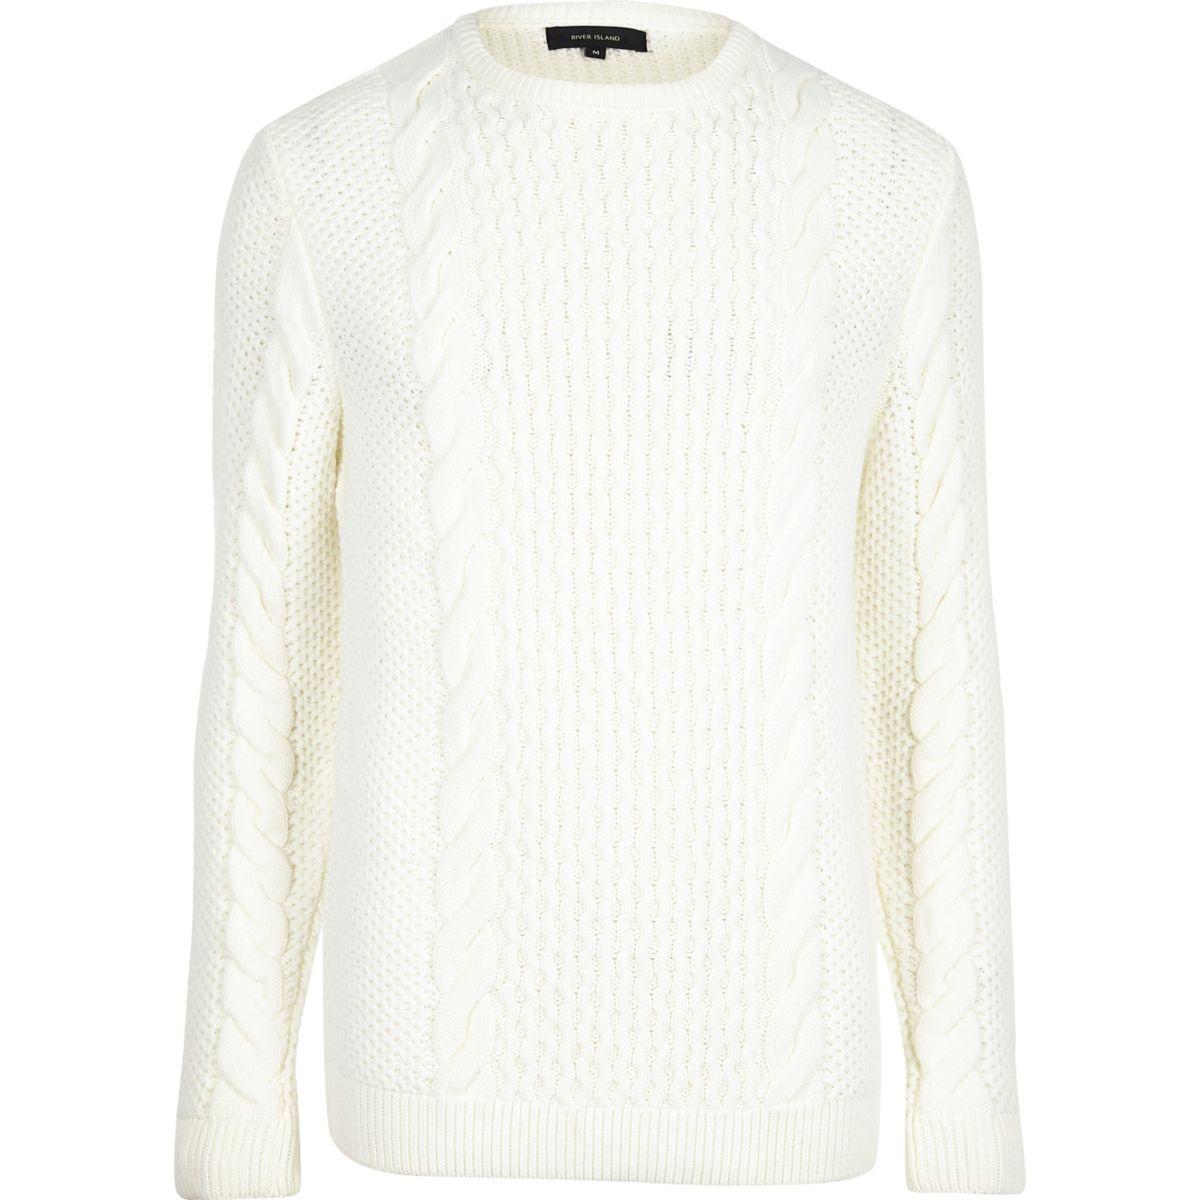 Cream cable knit crew neck sweater